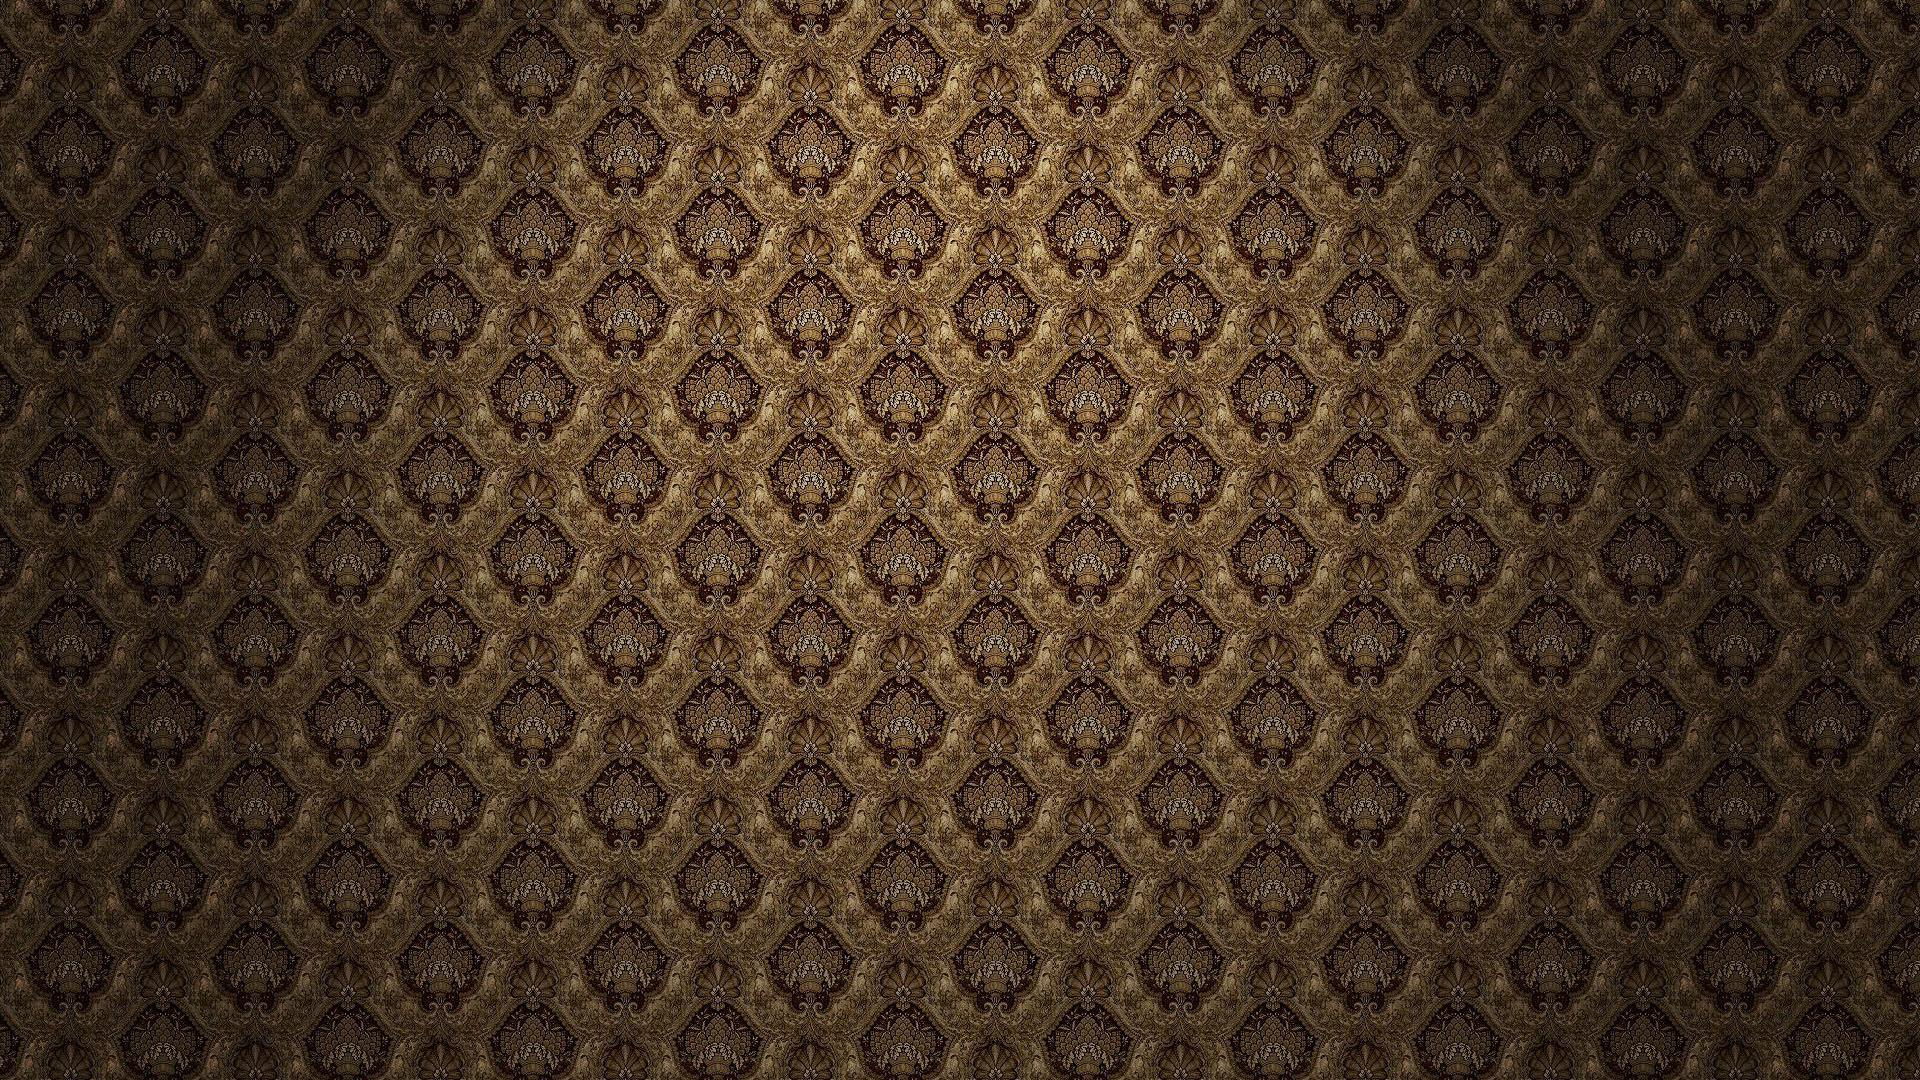 wallpaper patterns vintage 2015   Grasscloth Wallpaper 1920x1080